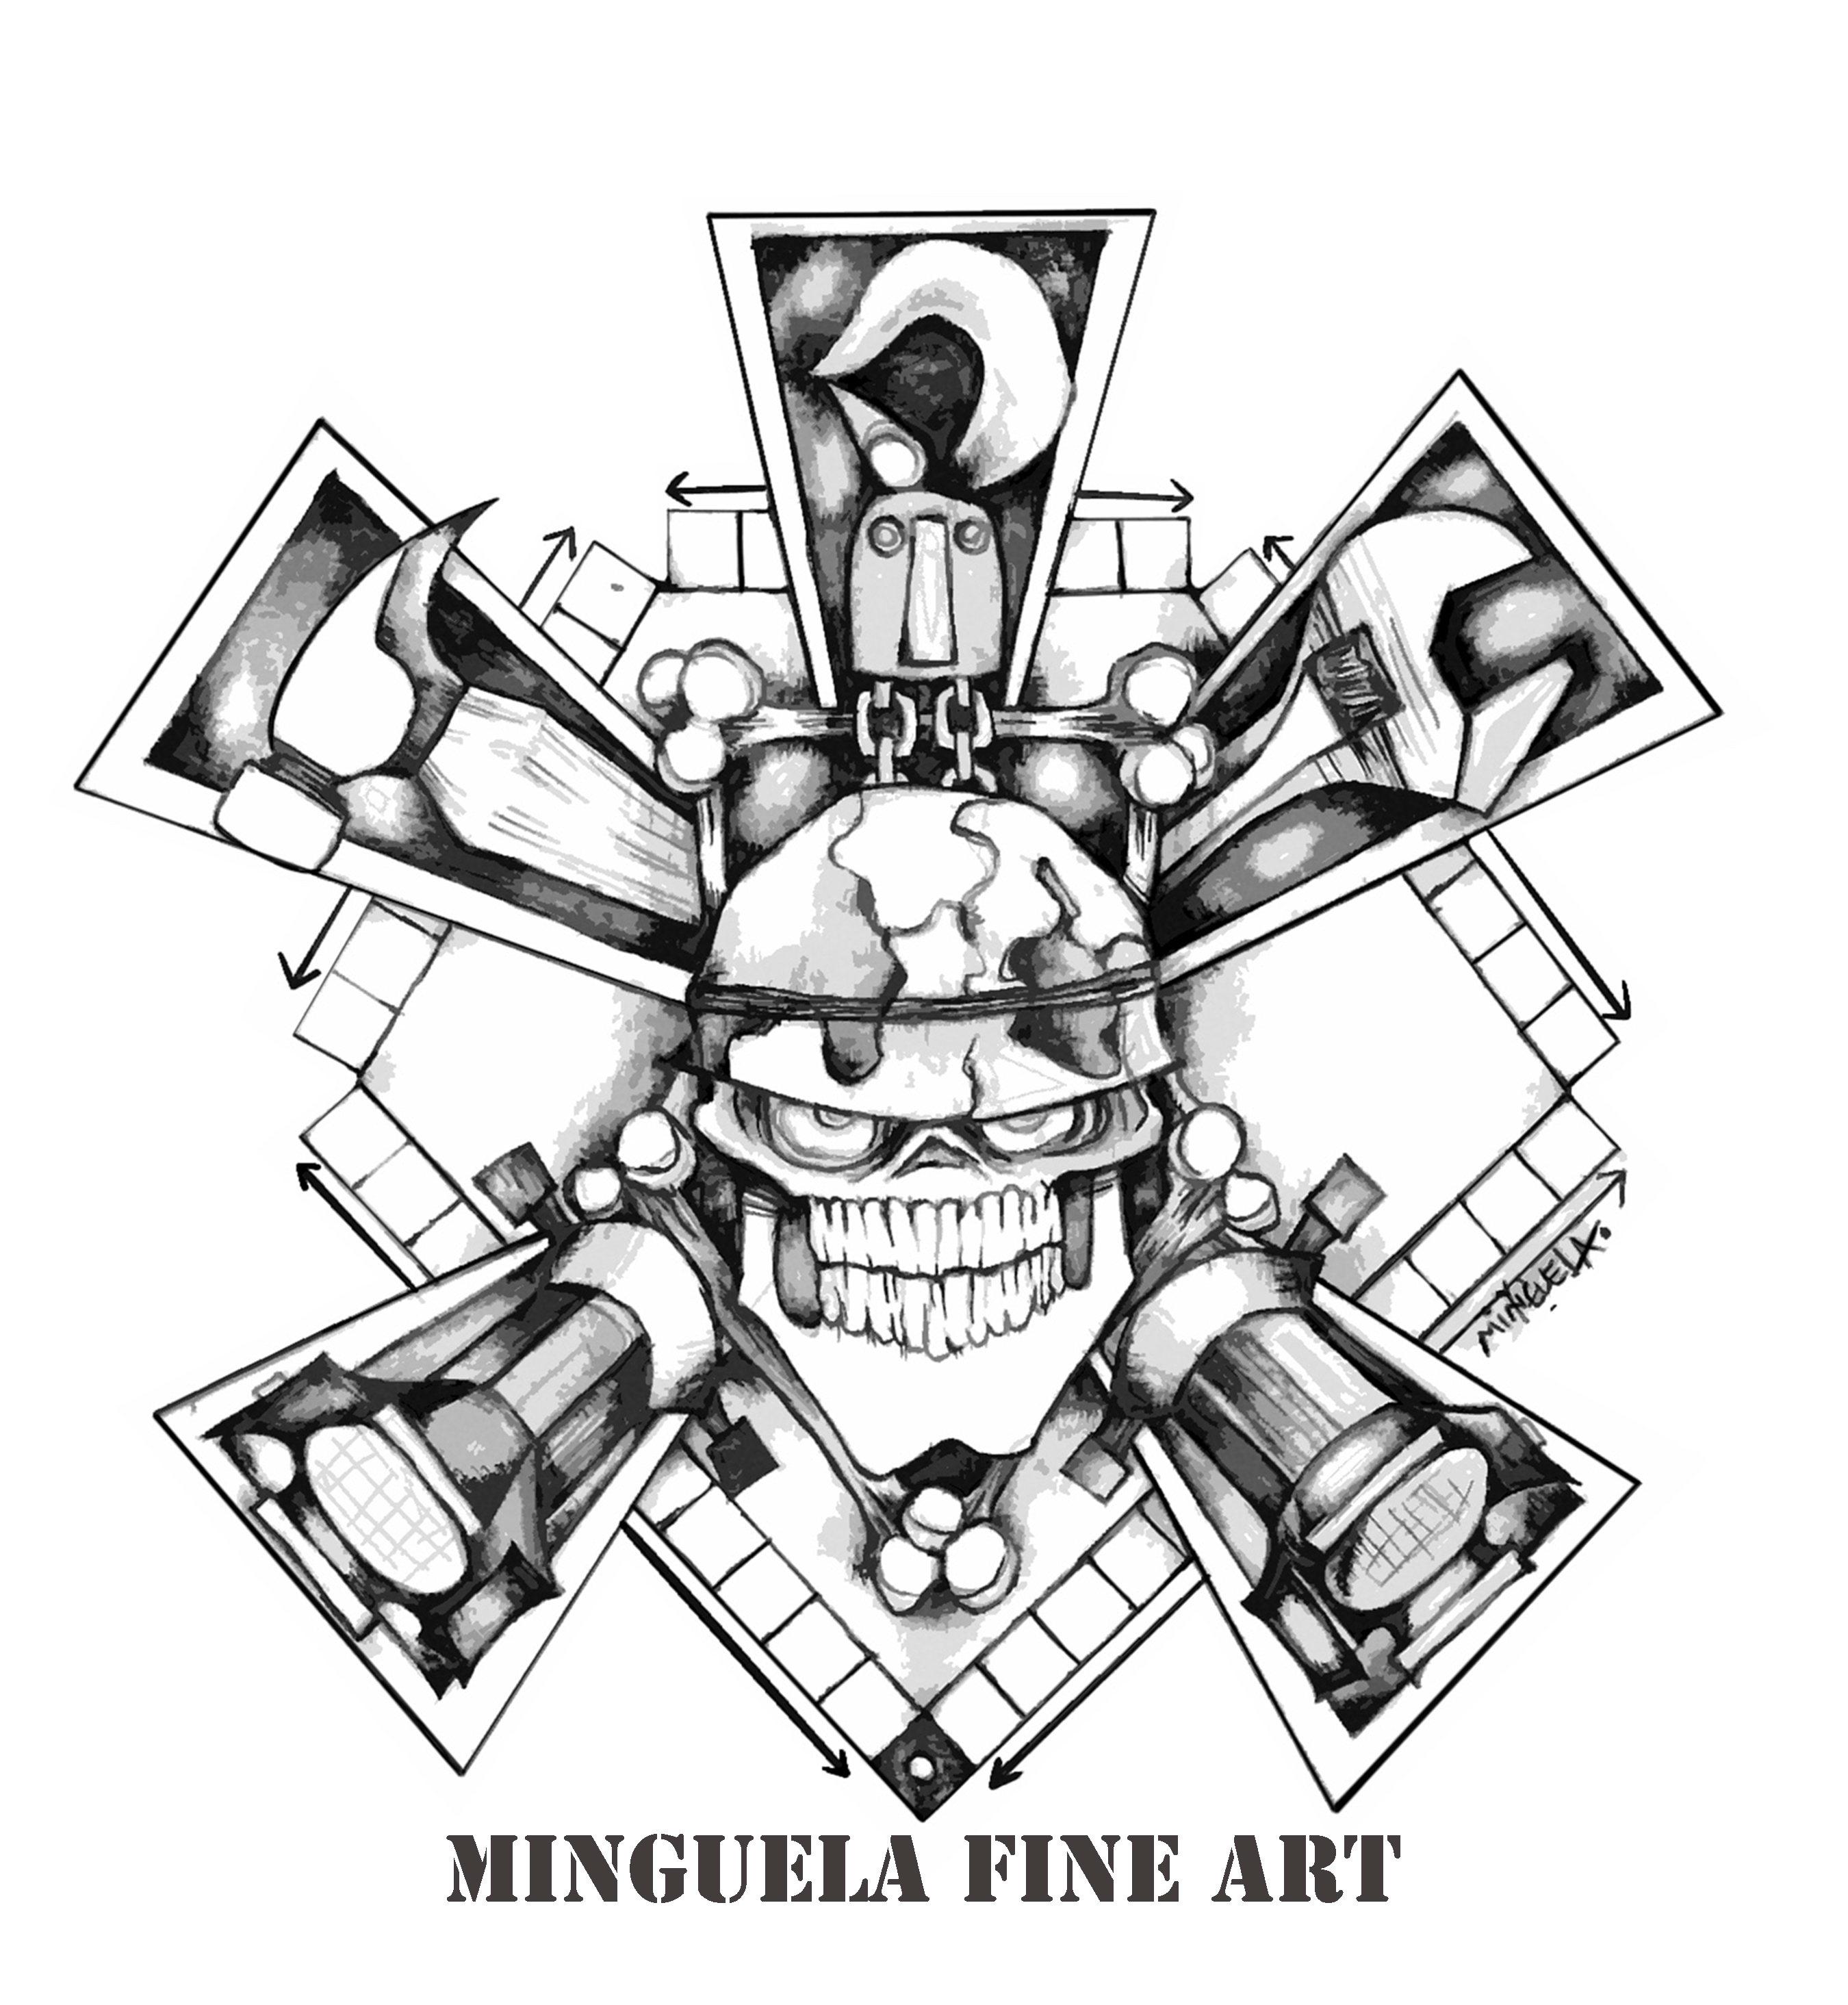 MinguelaFineArt